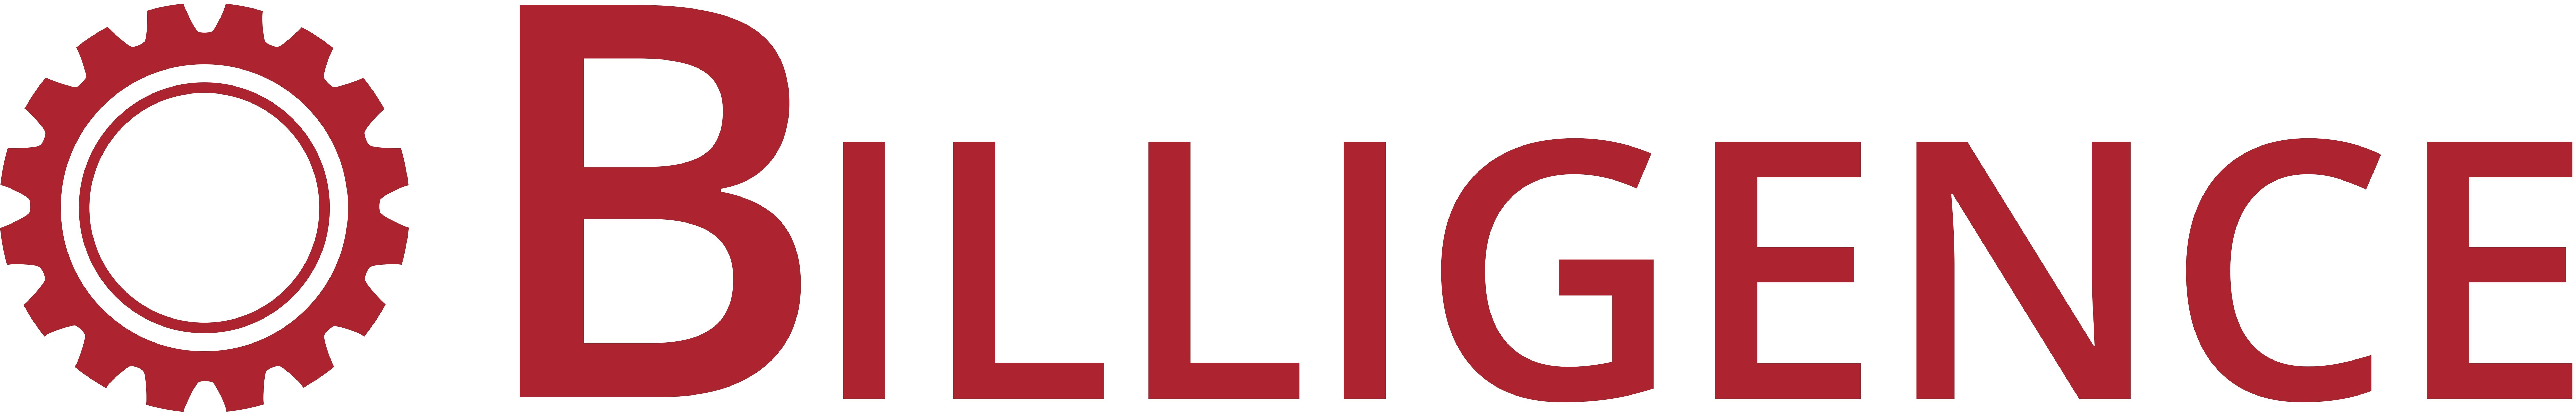 Billigence-final_no tag_red